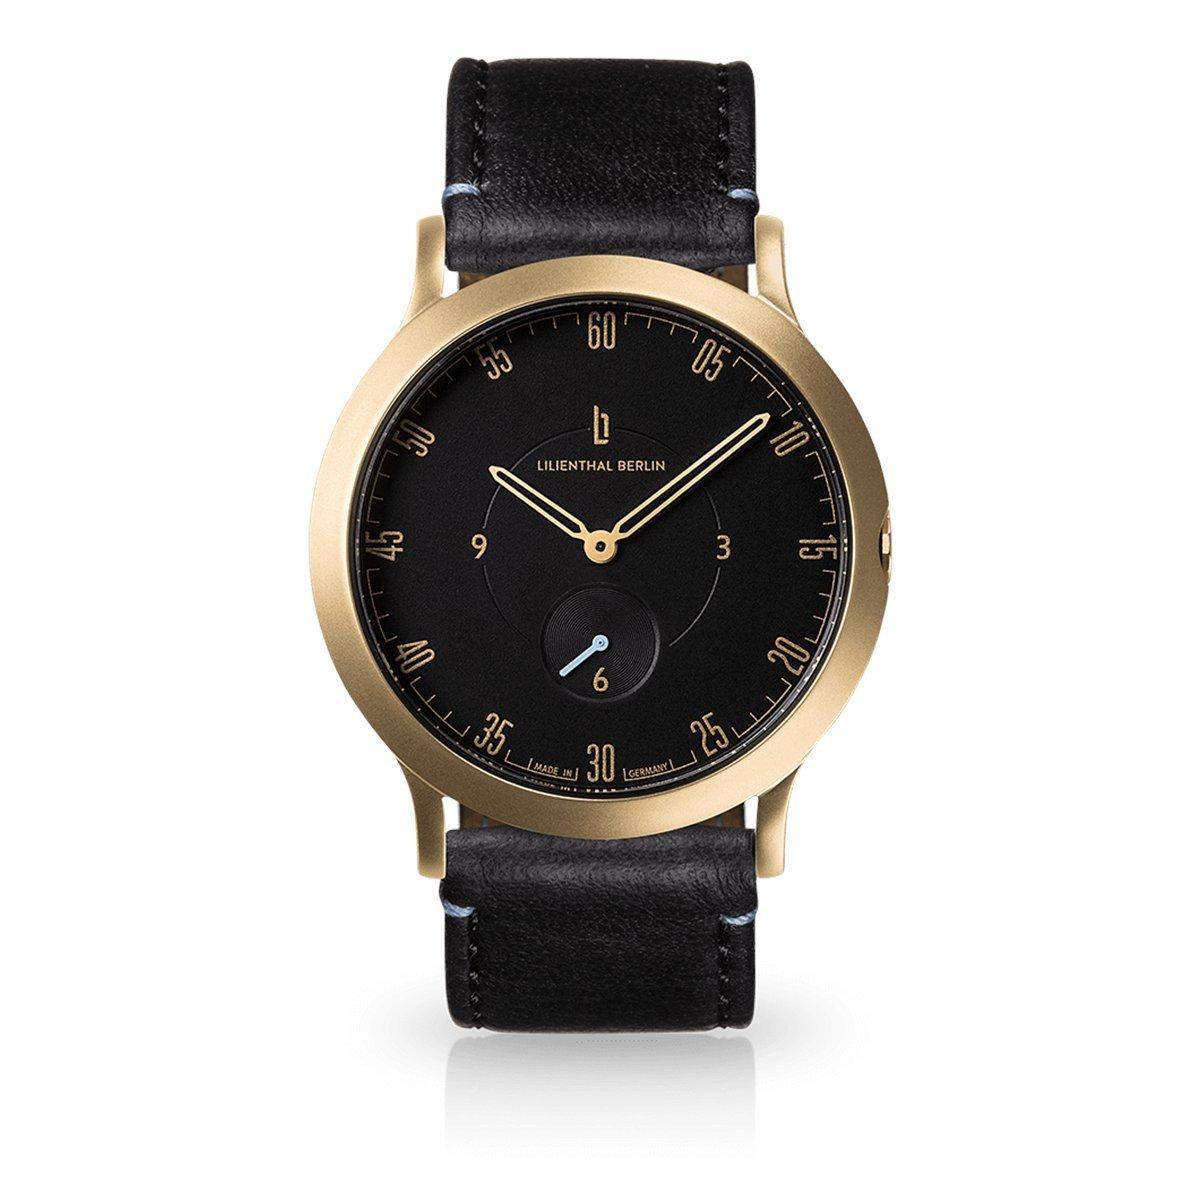 Lilienthal Berlin -Made in Germany- ベルリンの新しい時計モデル L1 ステンレススチール ケース B01N2JKKXV サイズ: 37.5 mm|ケース:ゴールド/ ダイアル:ブラック / ストラップ:ブラック ケース:ゴールド/ ダイアル:ブラック / ストラップ:ブラック サイズ: 37.5 mm